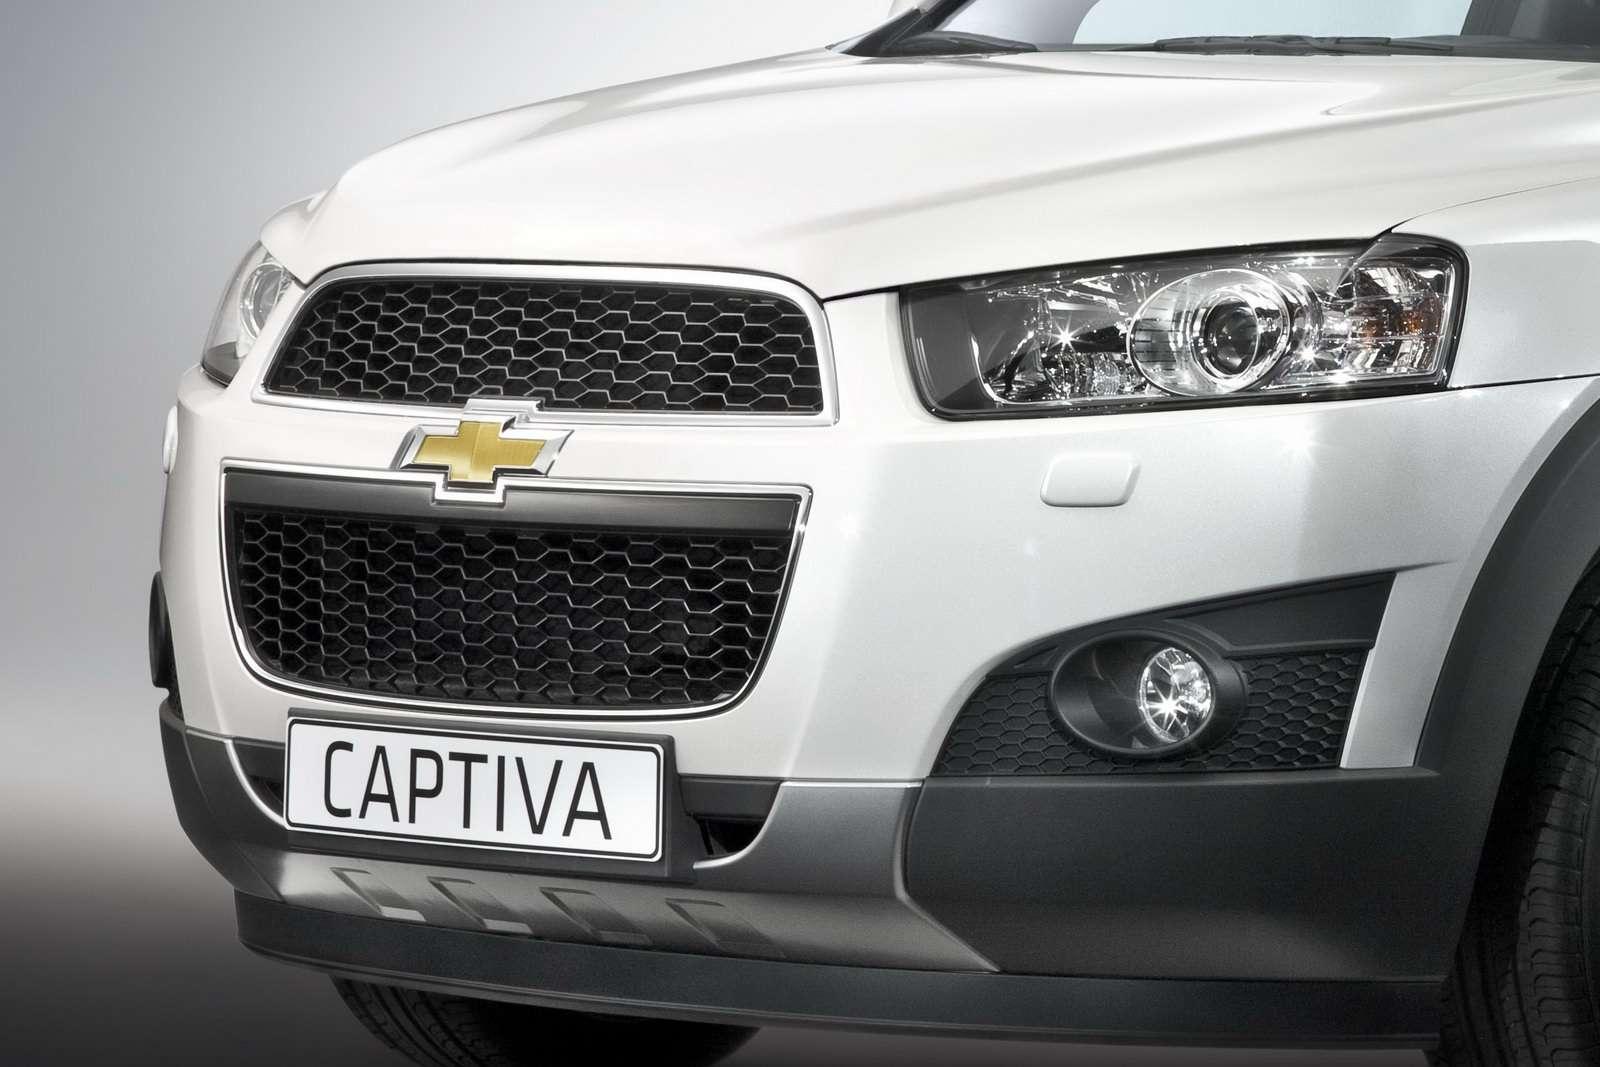 Chevrolet Captiva 2011 przed paris wrzesien 2010